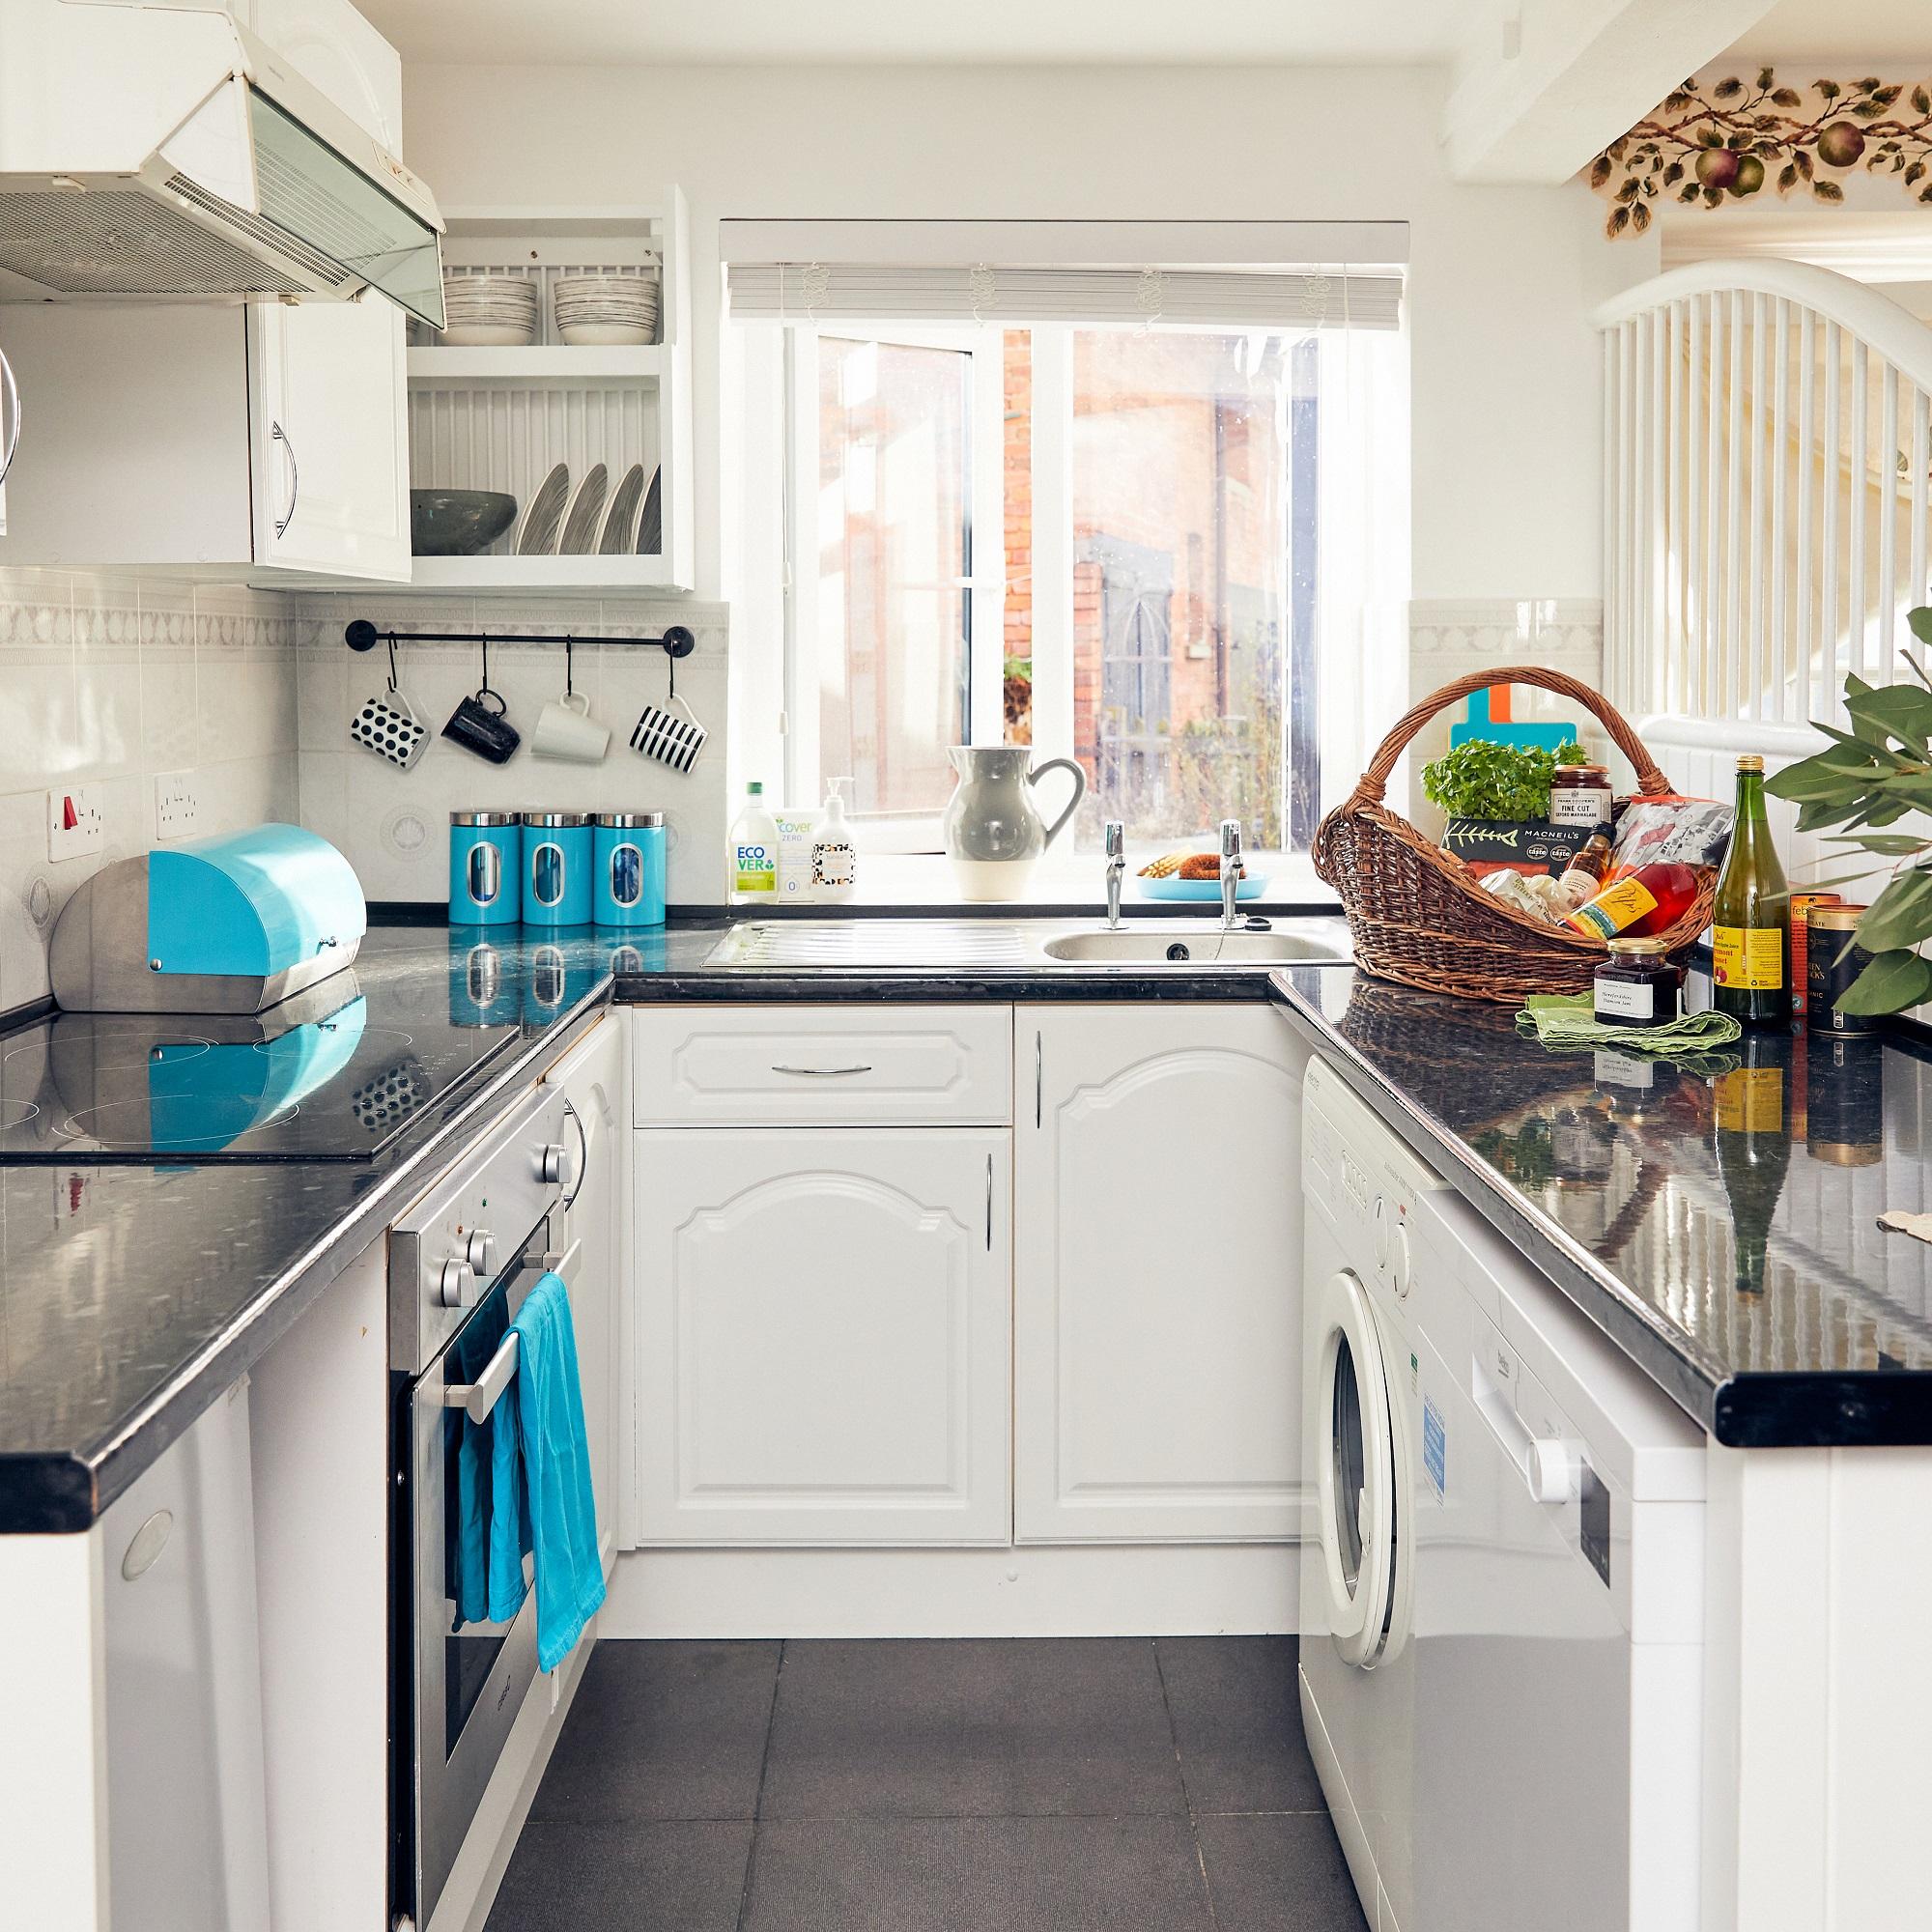 Kitchen at Apple Bough Cottage, Upper Newton Farm, Herefordshire Holidays